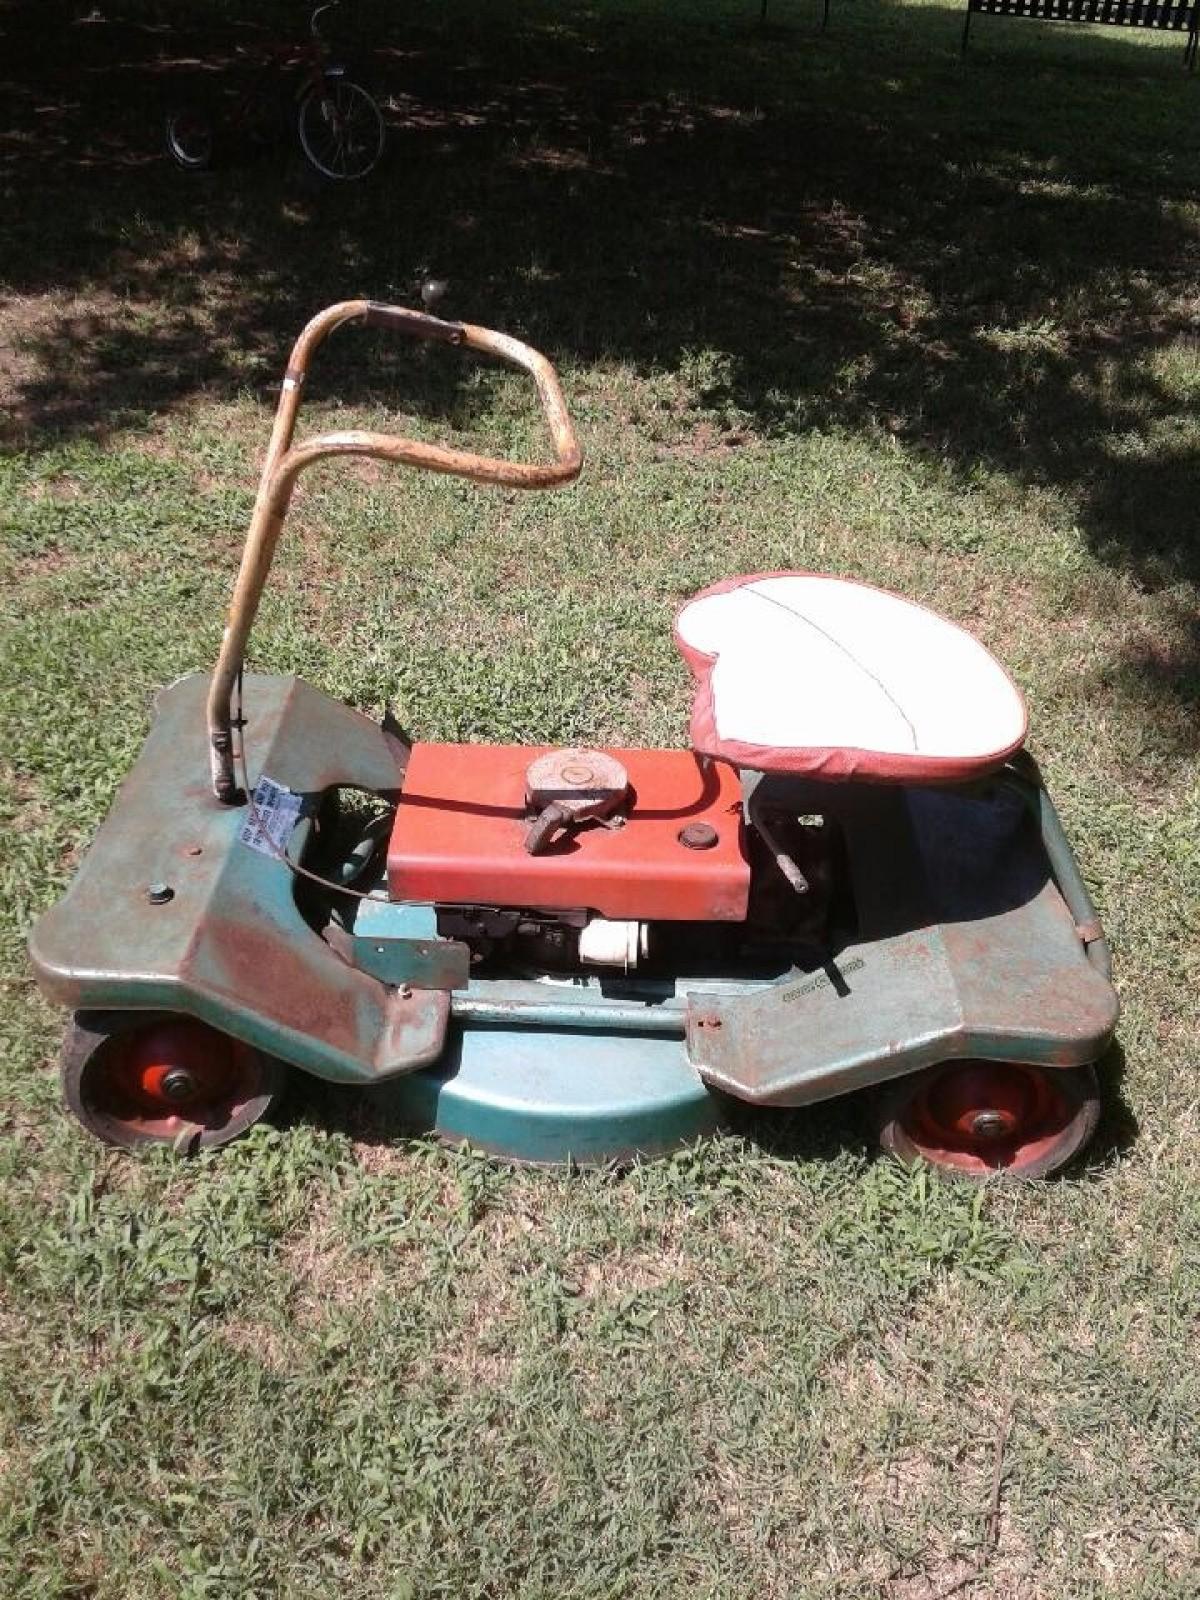 Value Of Vintage Craftsman Riding Mower Thriftyfun